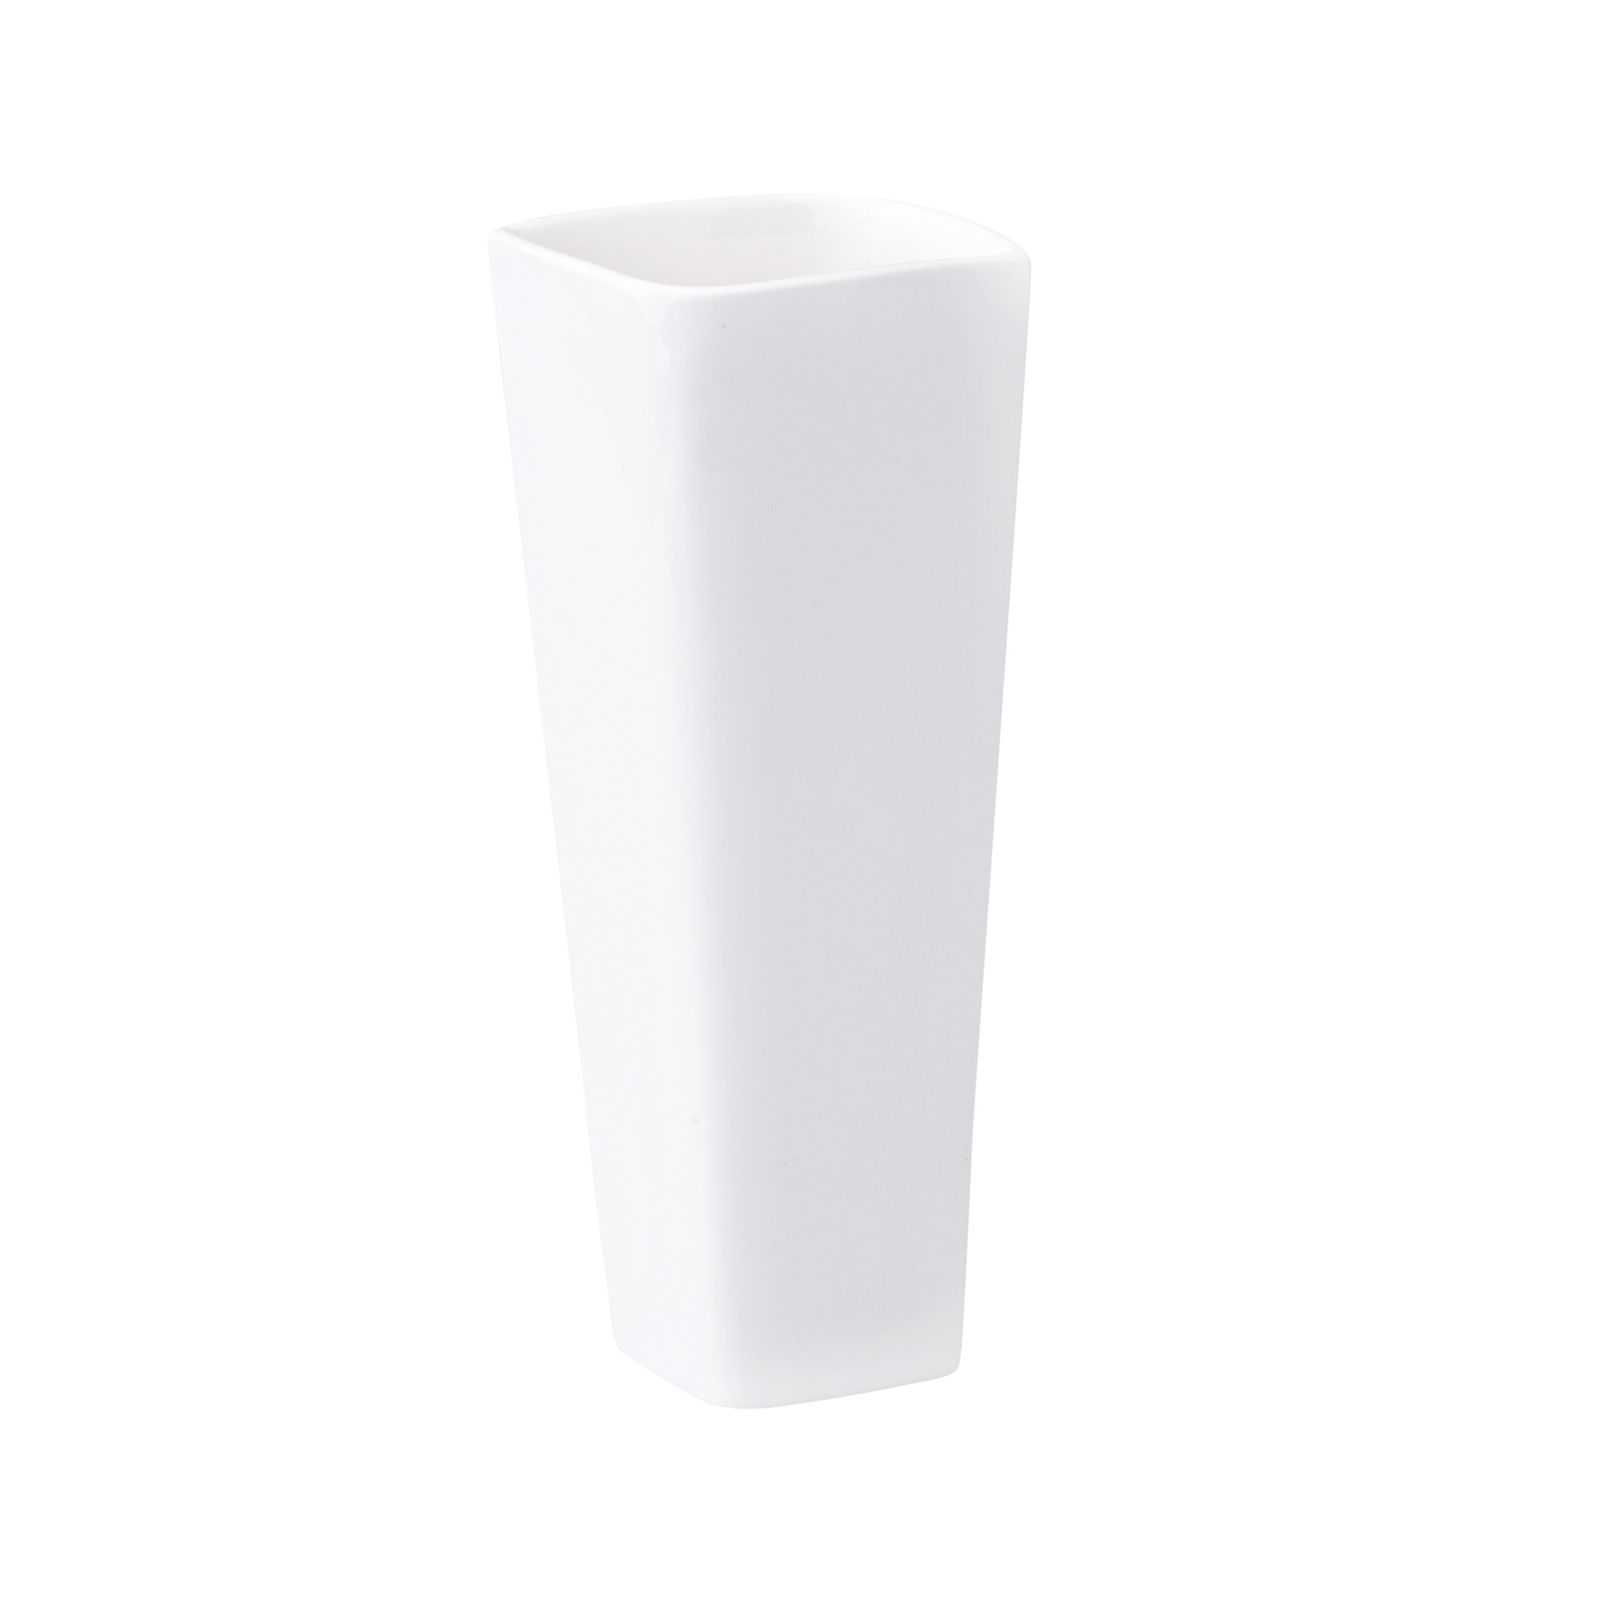 Wazon Kubiko / Fala 16,5 cm AMBITION